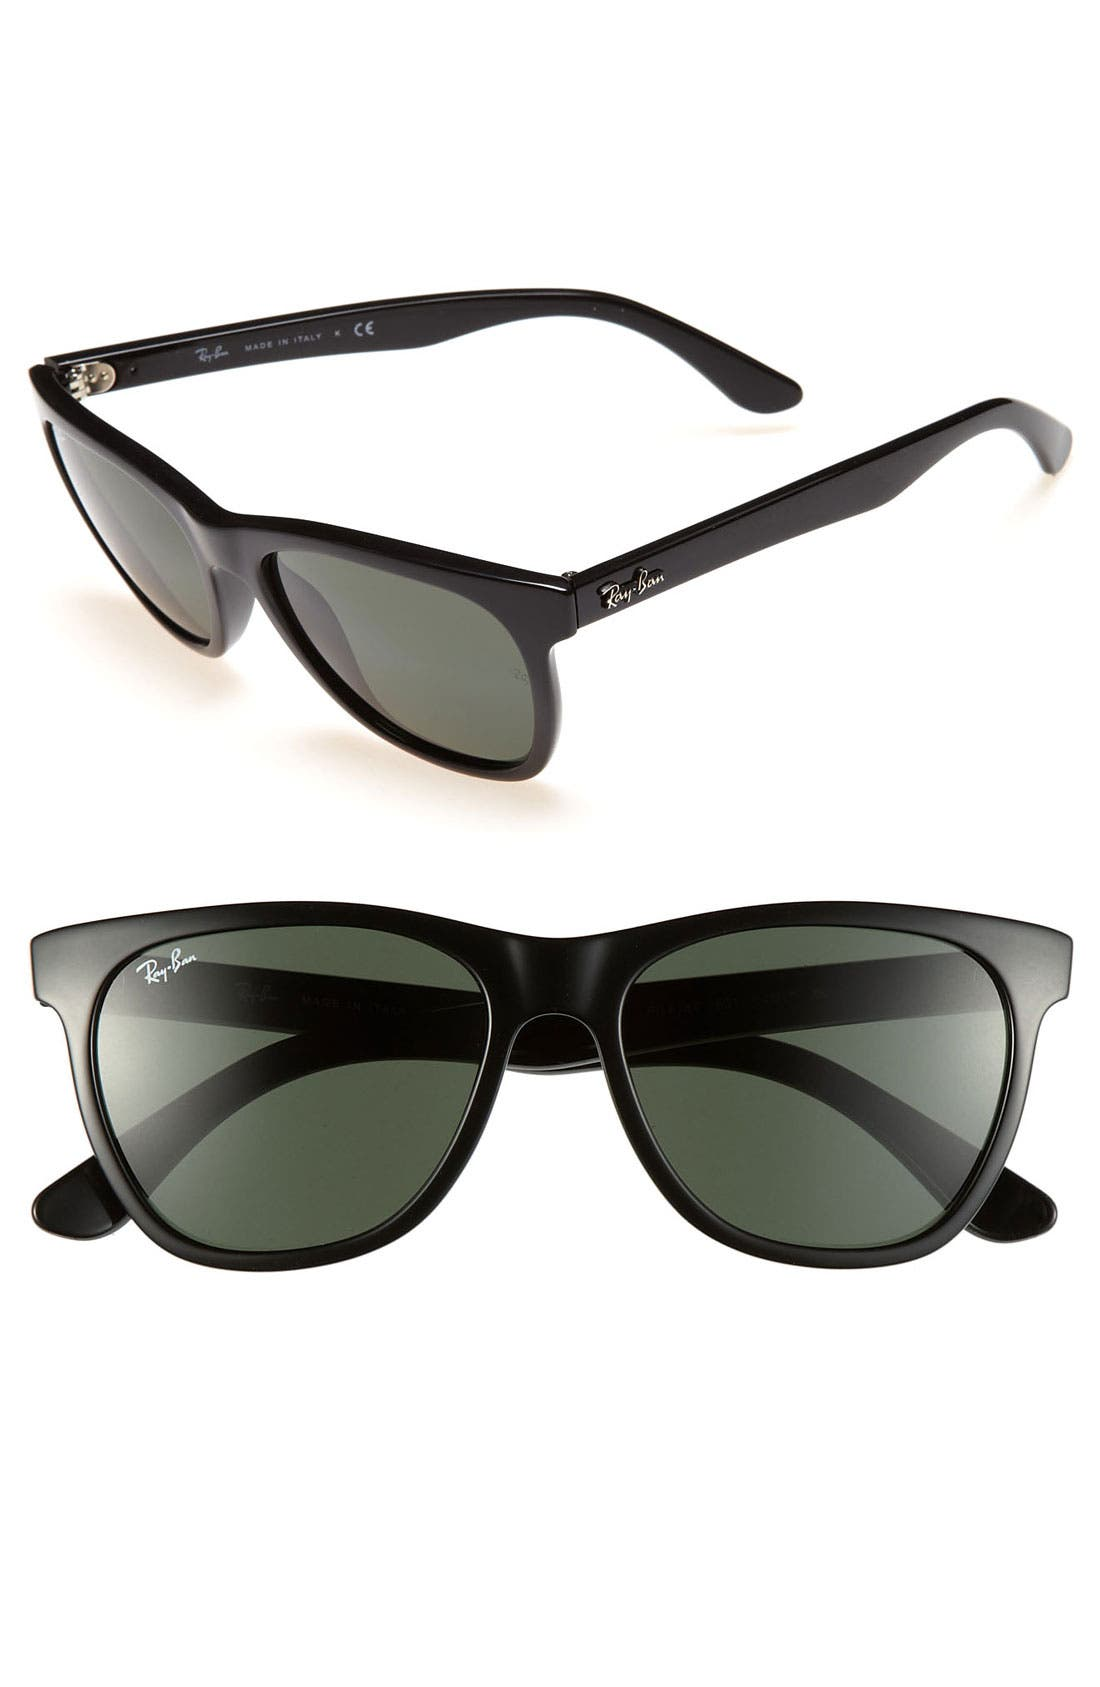 Main Image - Ray-Ban 'High Street' 54mm Sunglasses